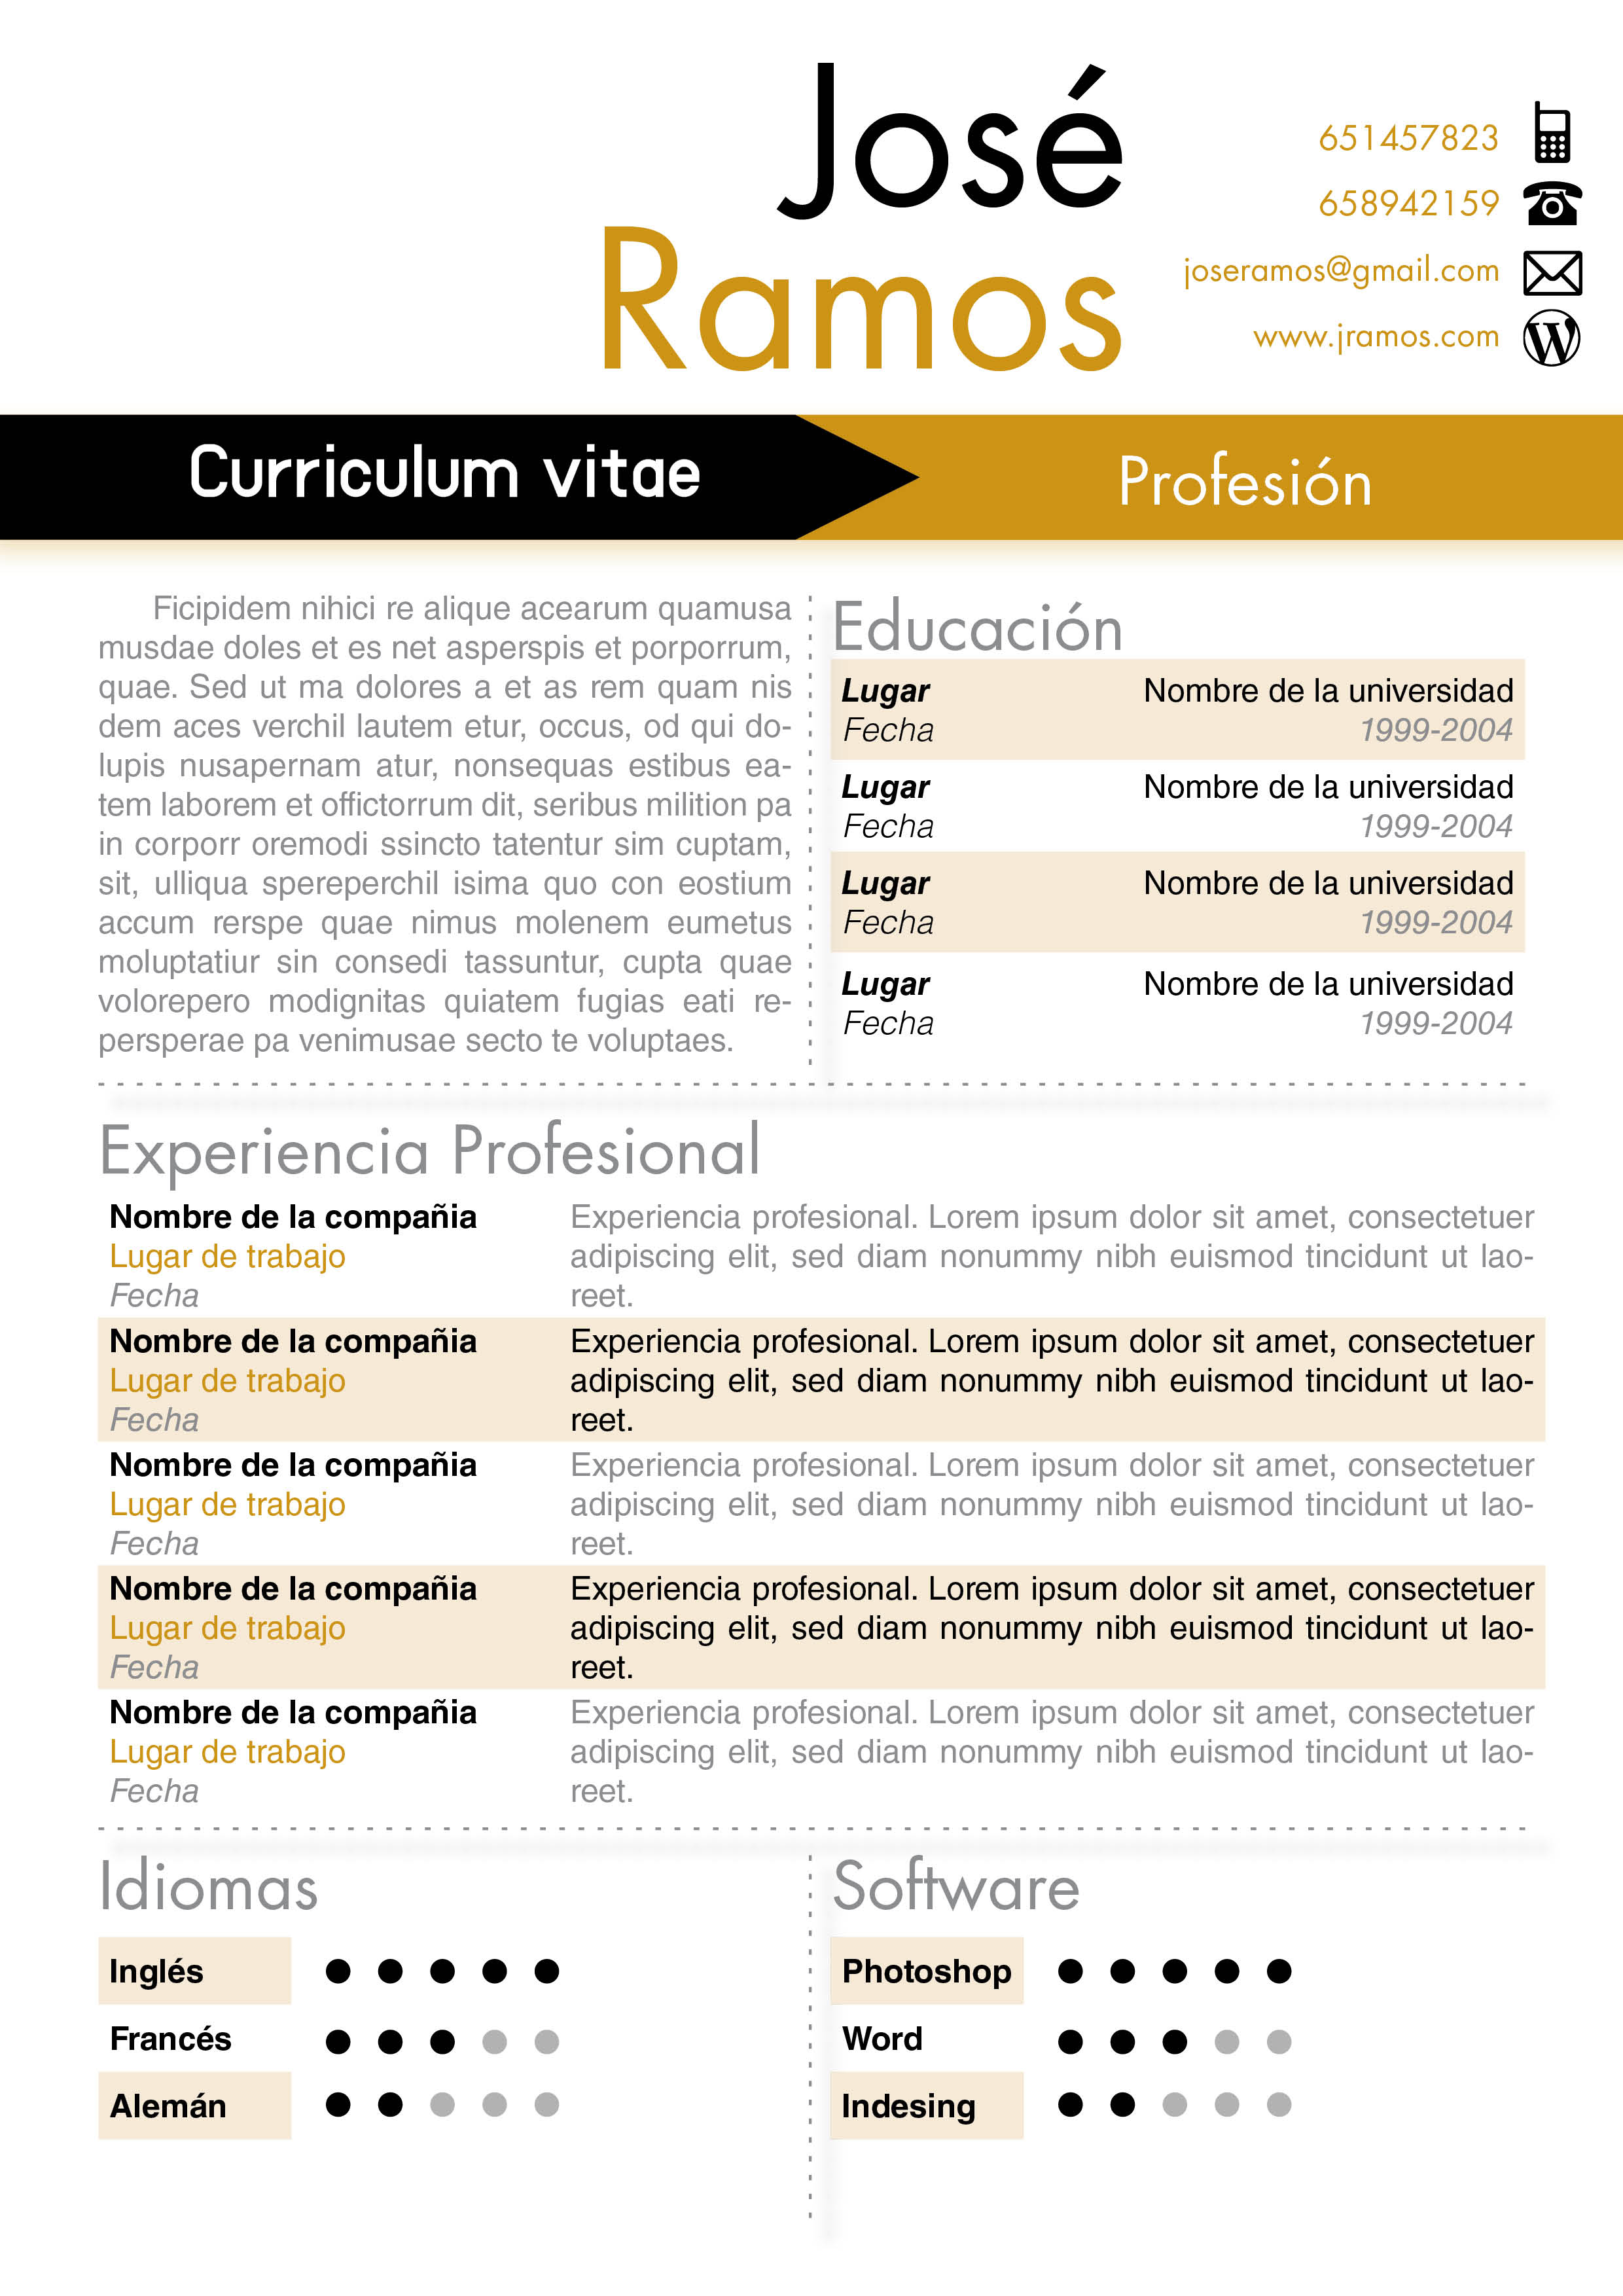 modelos de curriculum vitae word para completar